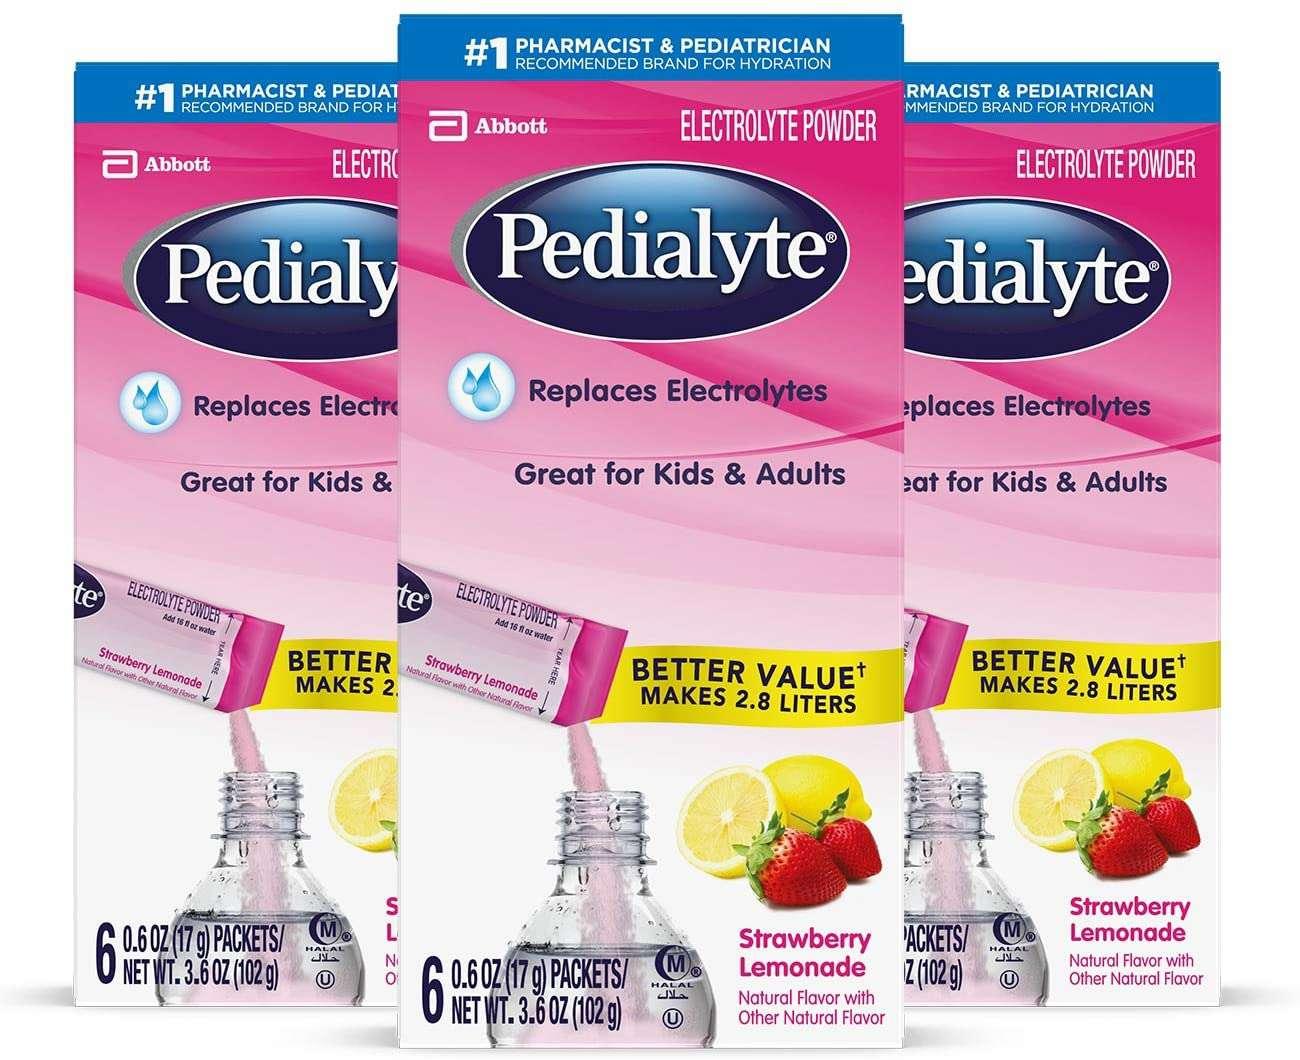 Pedialyte Electrolyte Powder Strawberry Lemonade